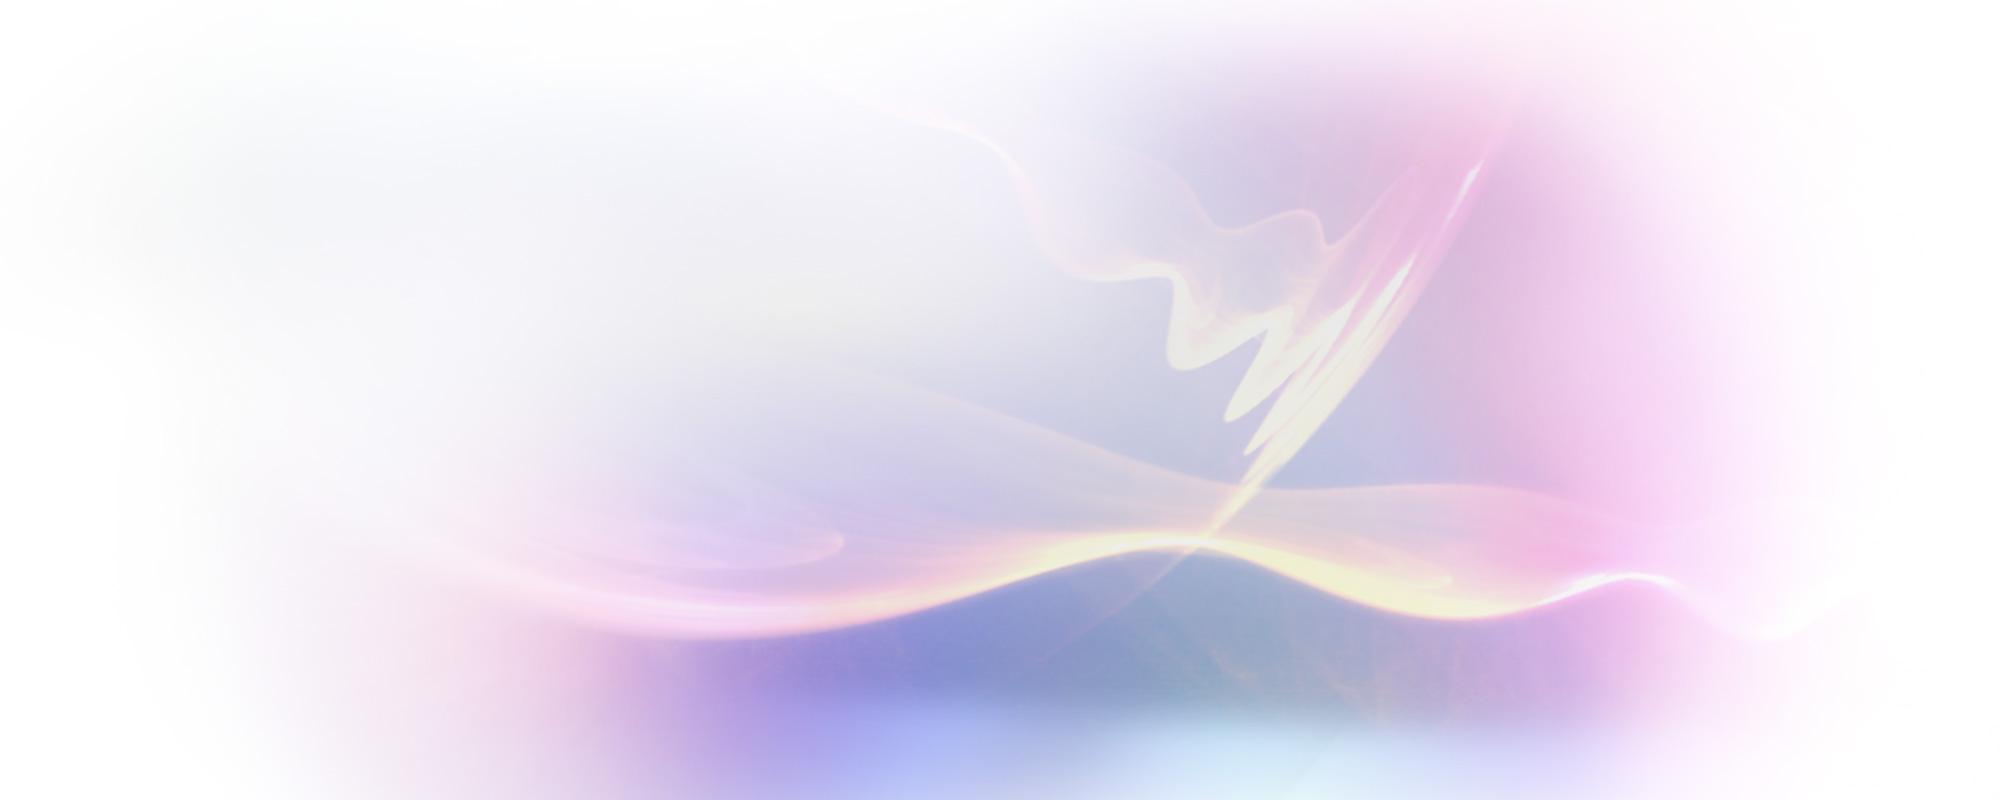 ASUS MeMO Pad 7 LTE (ME375CL) | Tablets | ASUS USA